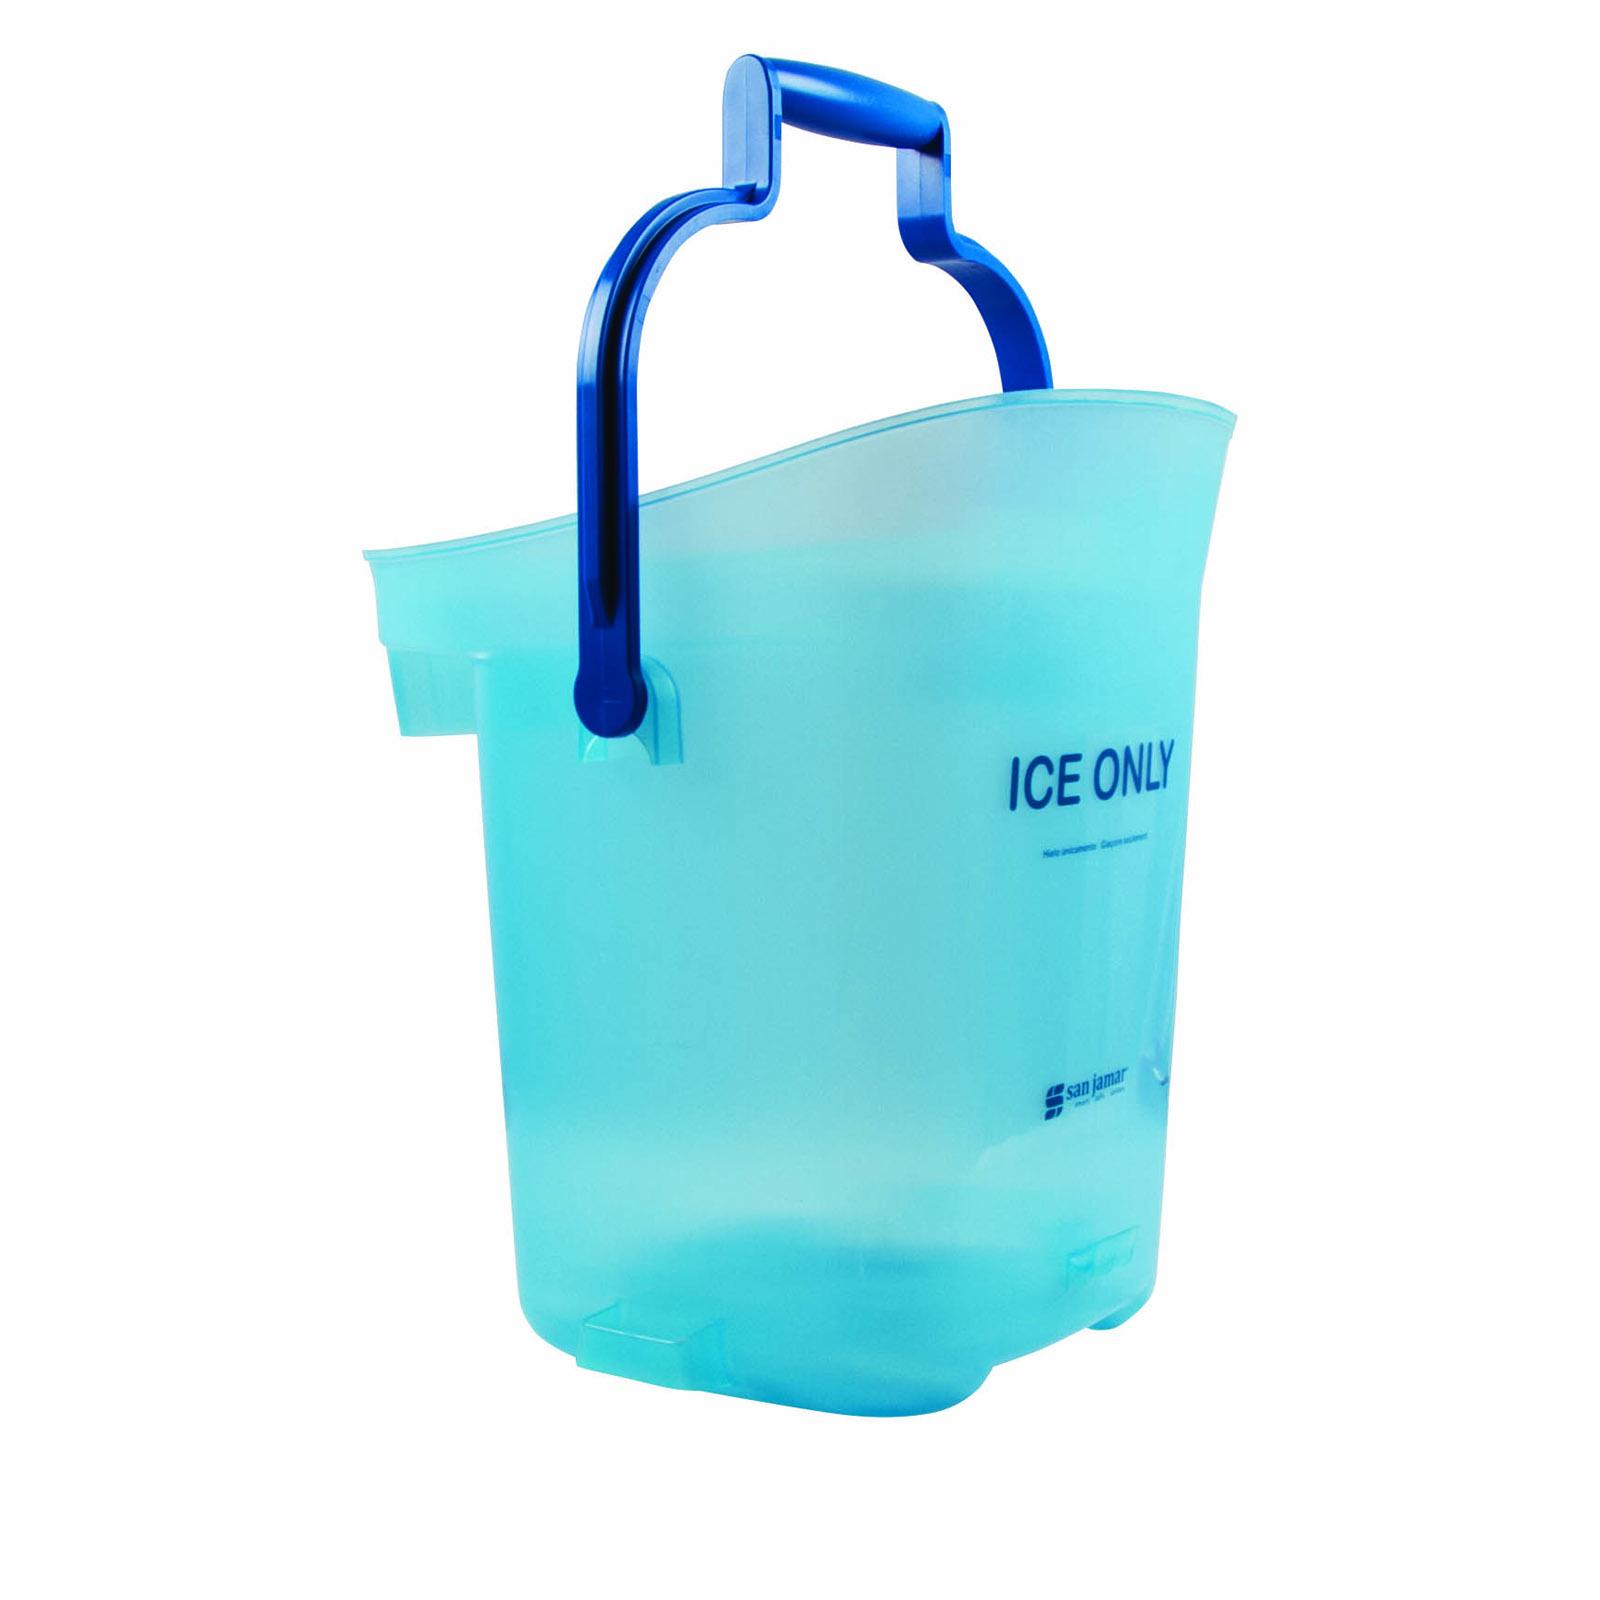 3500-31 San Jamar SILD6000 ice tote